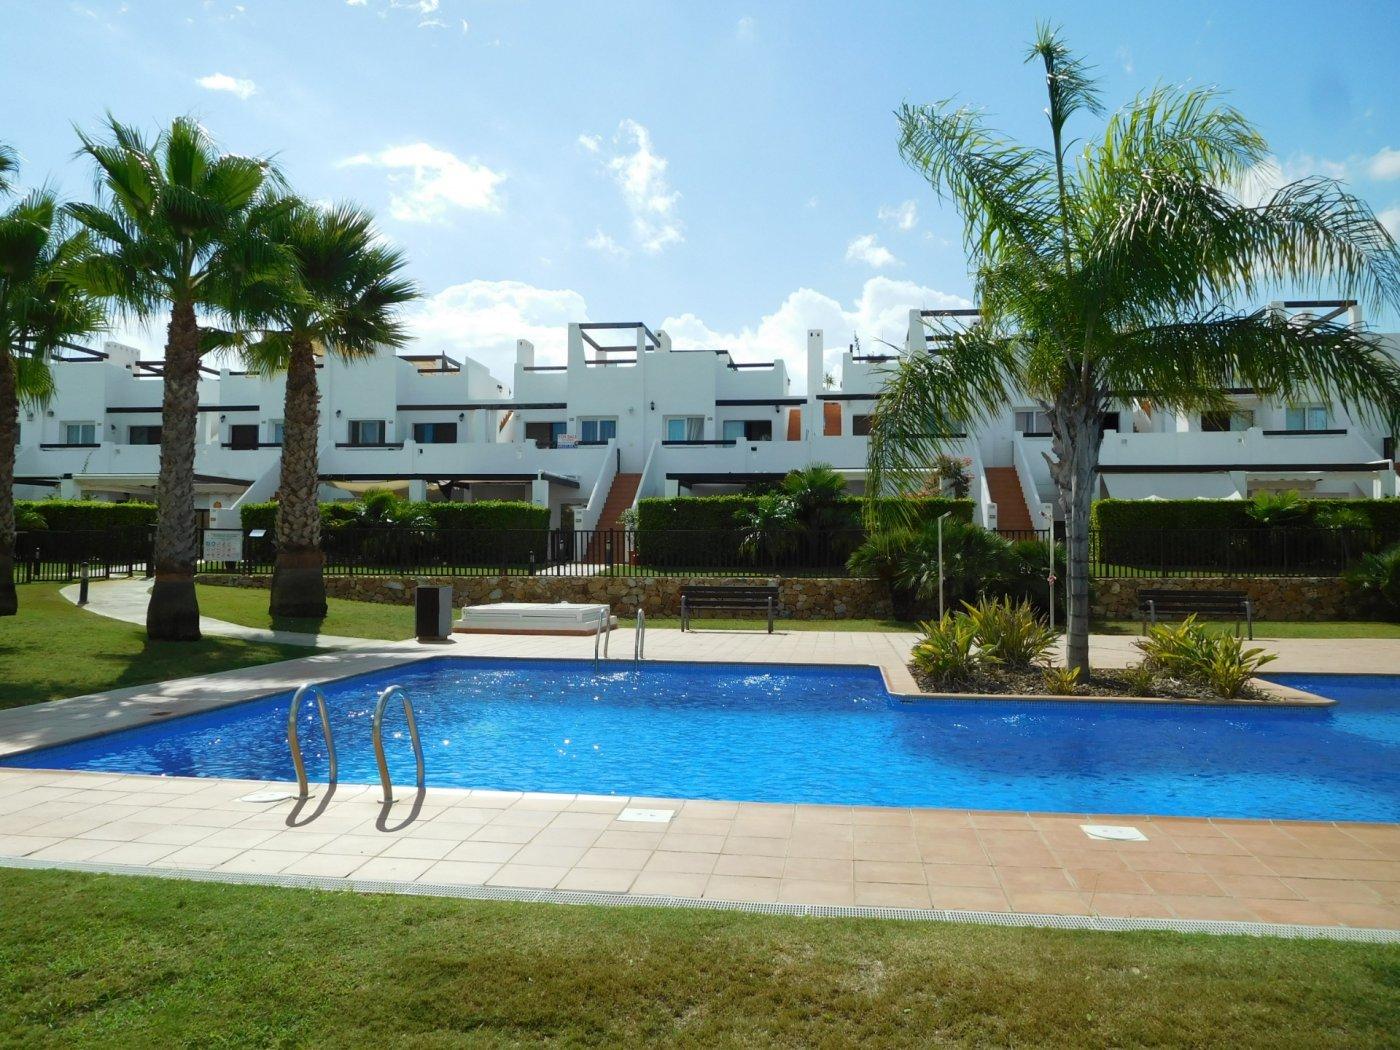 Gallery Image 26 of Apartment For rent in Condado De Alhama, Alhama De Murcia With Pool